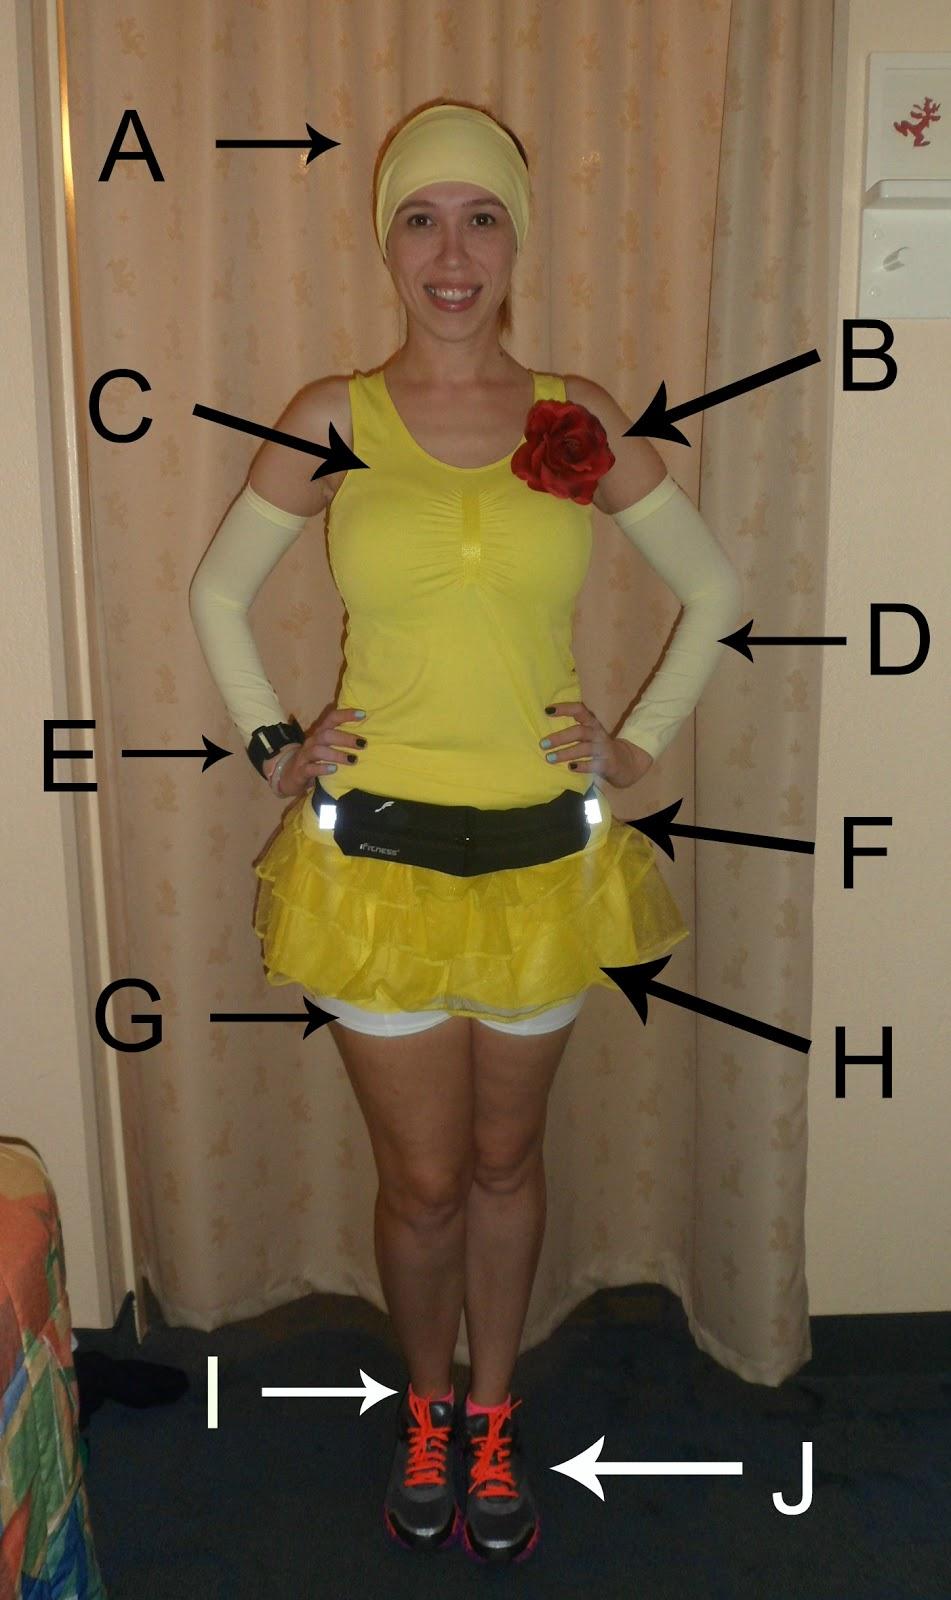 Live Laugh Run Disney Anatomy Of A Race Costume